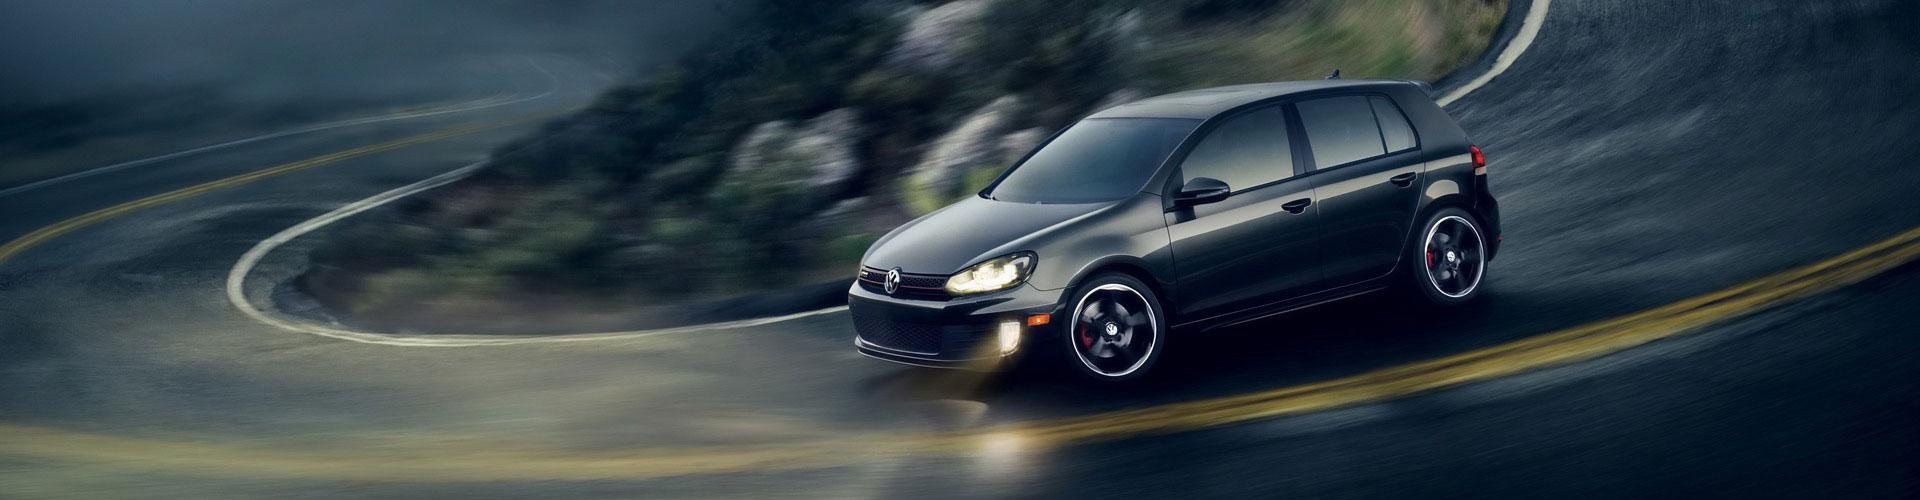 Volkswagen Νέα Μοντέλα - Γ. Καψιώχας Α.Ε.Β.Ε. - Εξουσιοδοτημένος έμπορος Kosmokar